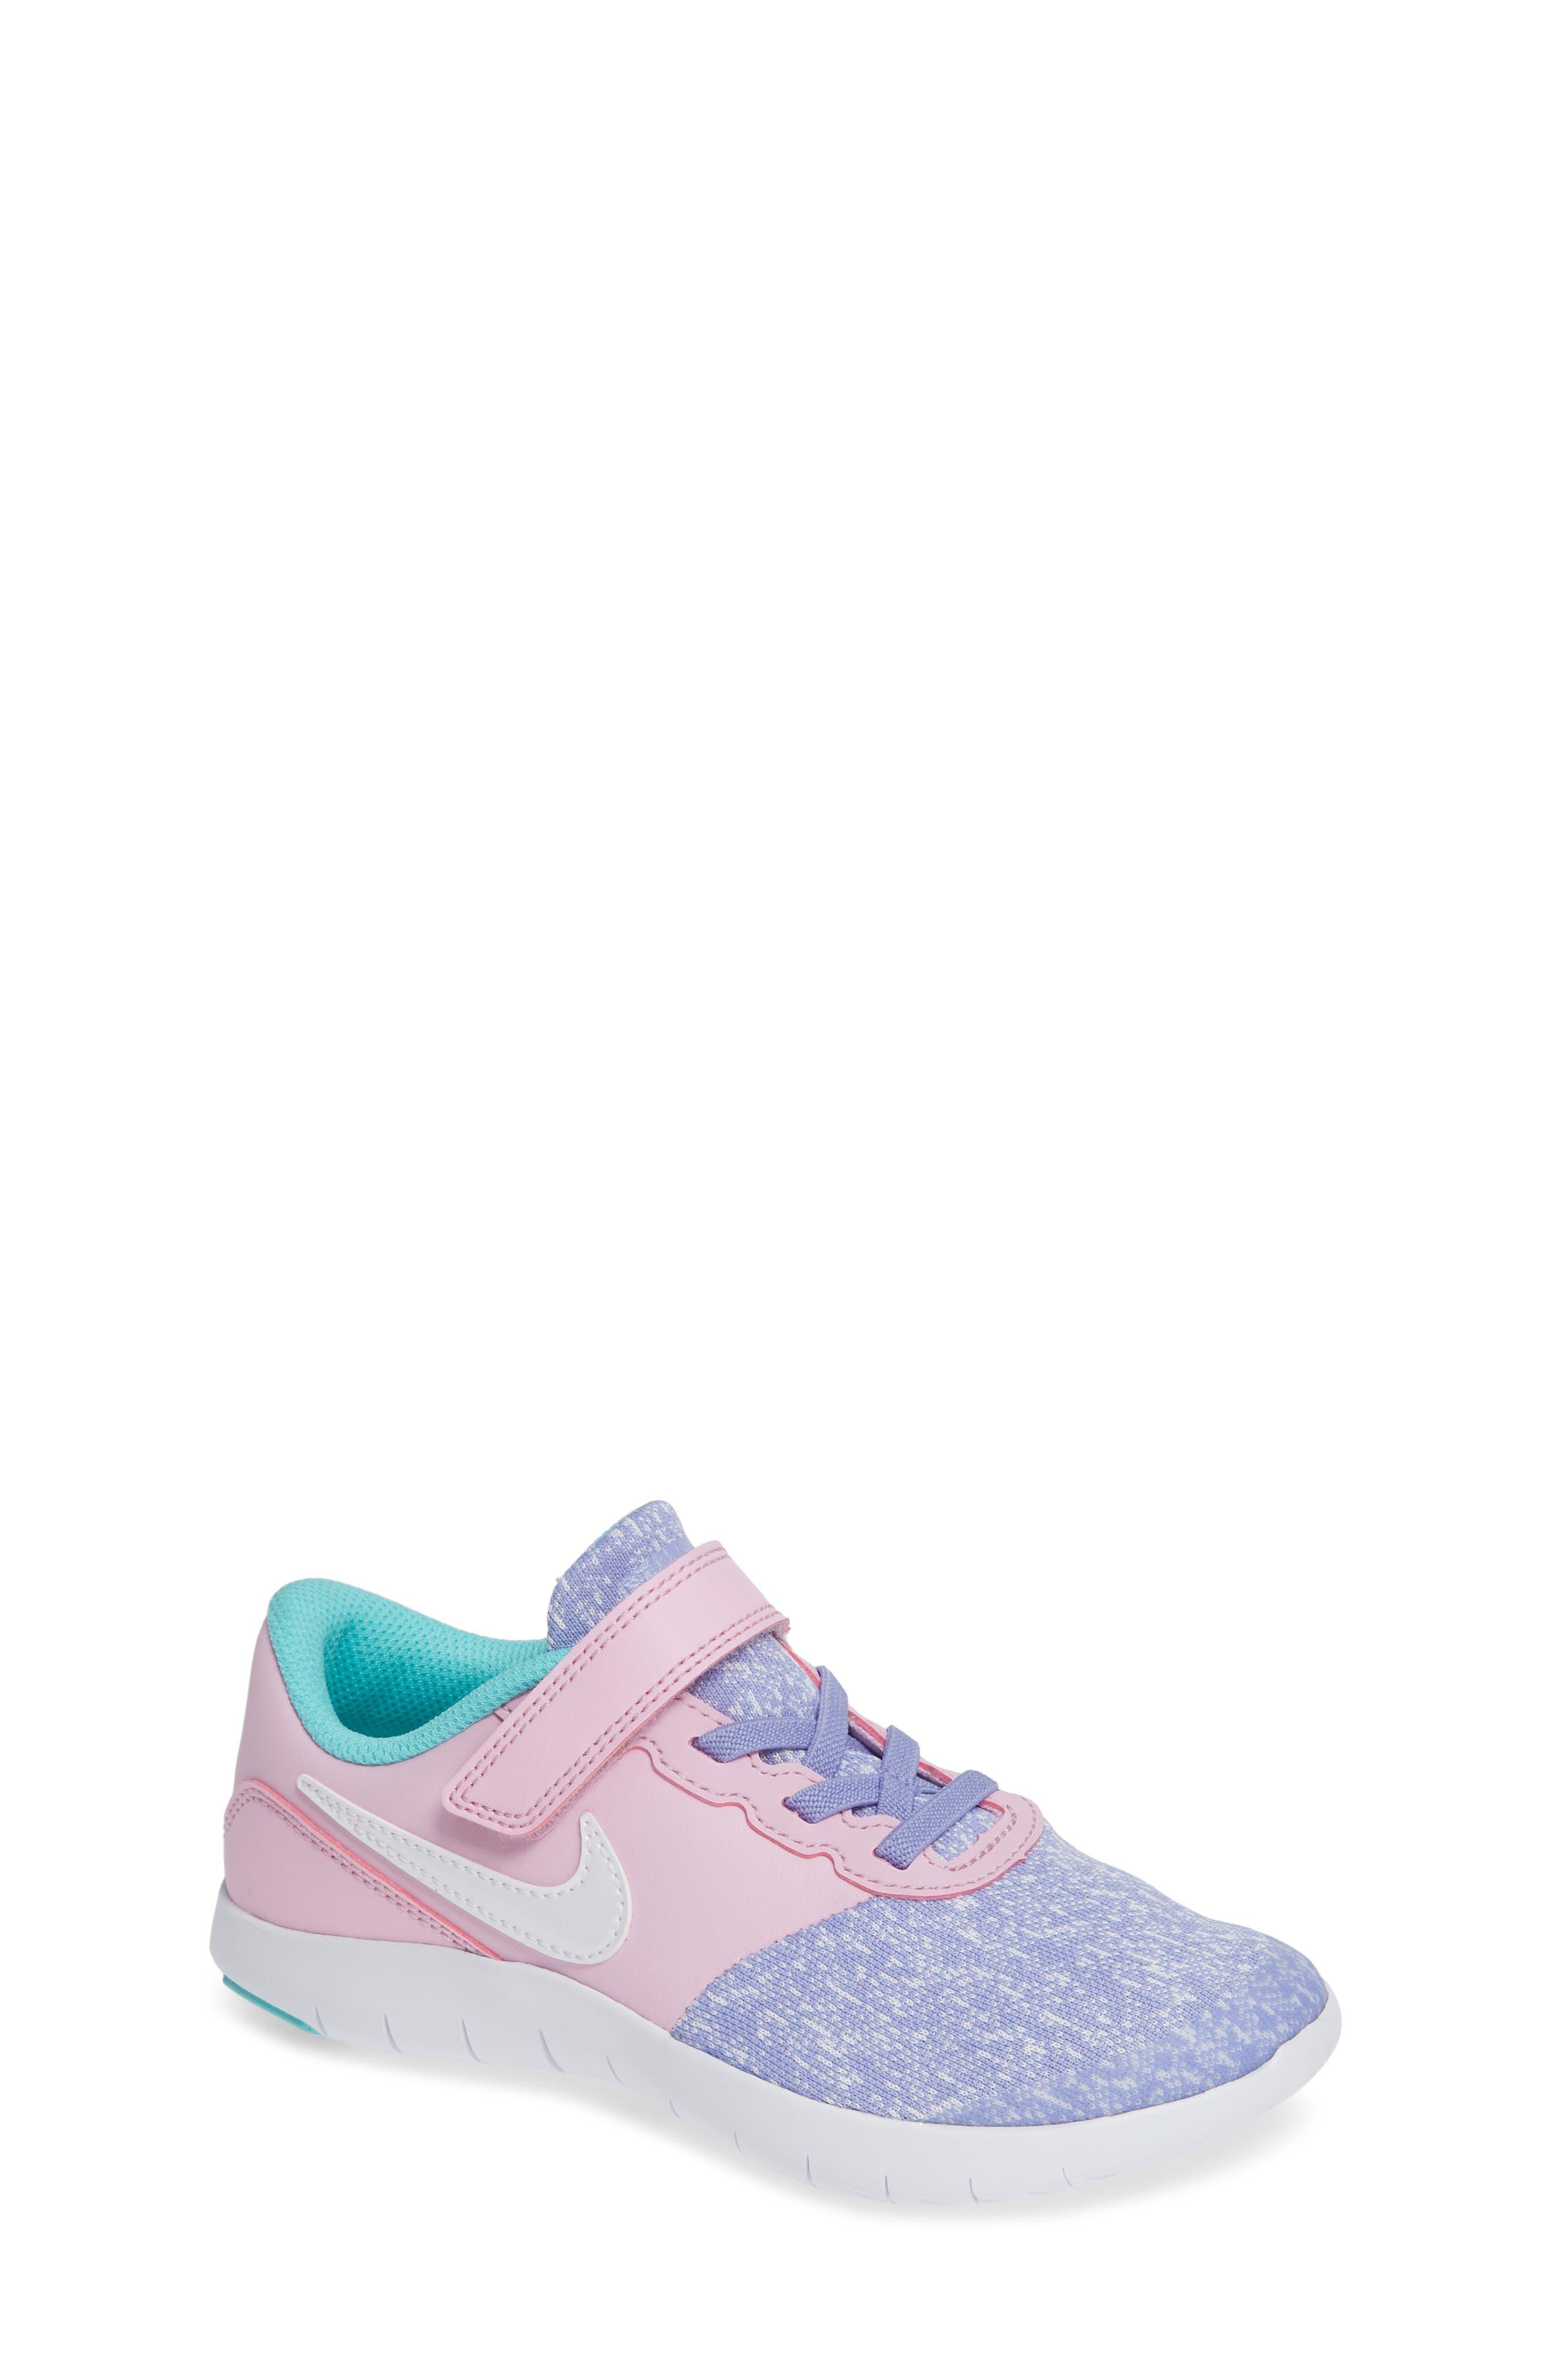 Flex Contact Running Shoe,                         Main,                         color, TWILIGHT PULSE WHITE AQUA